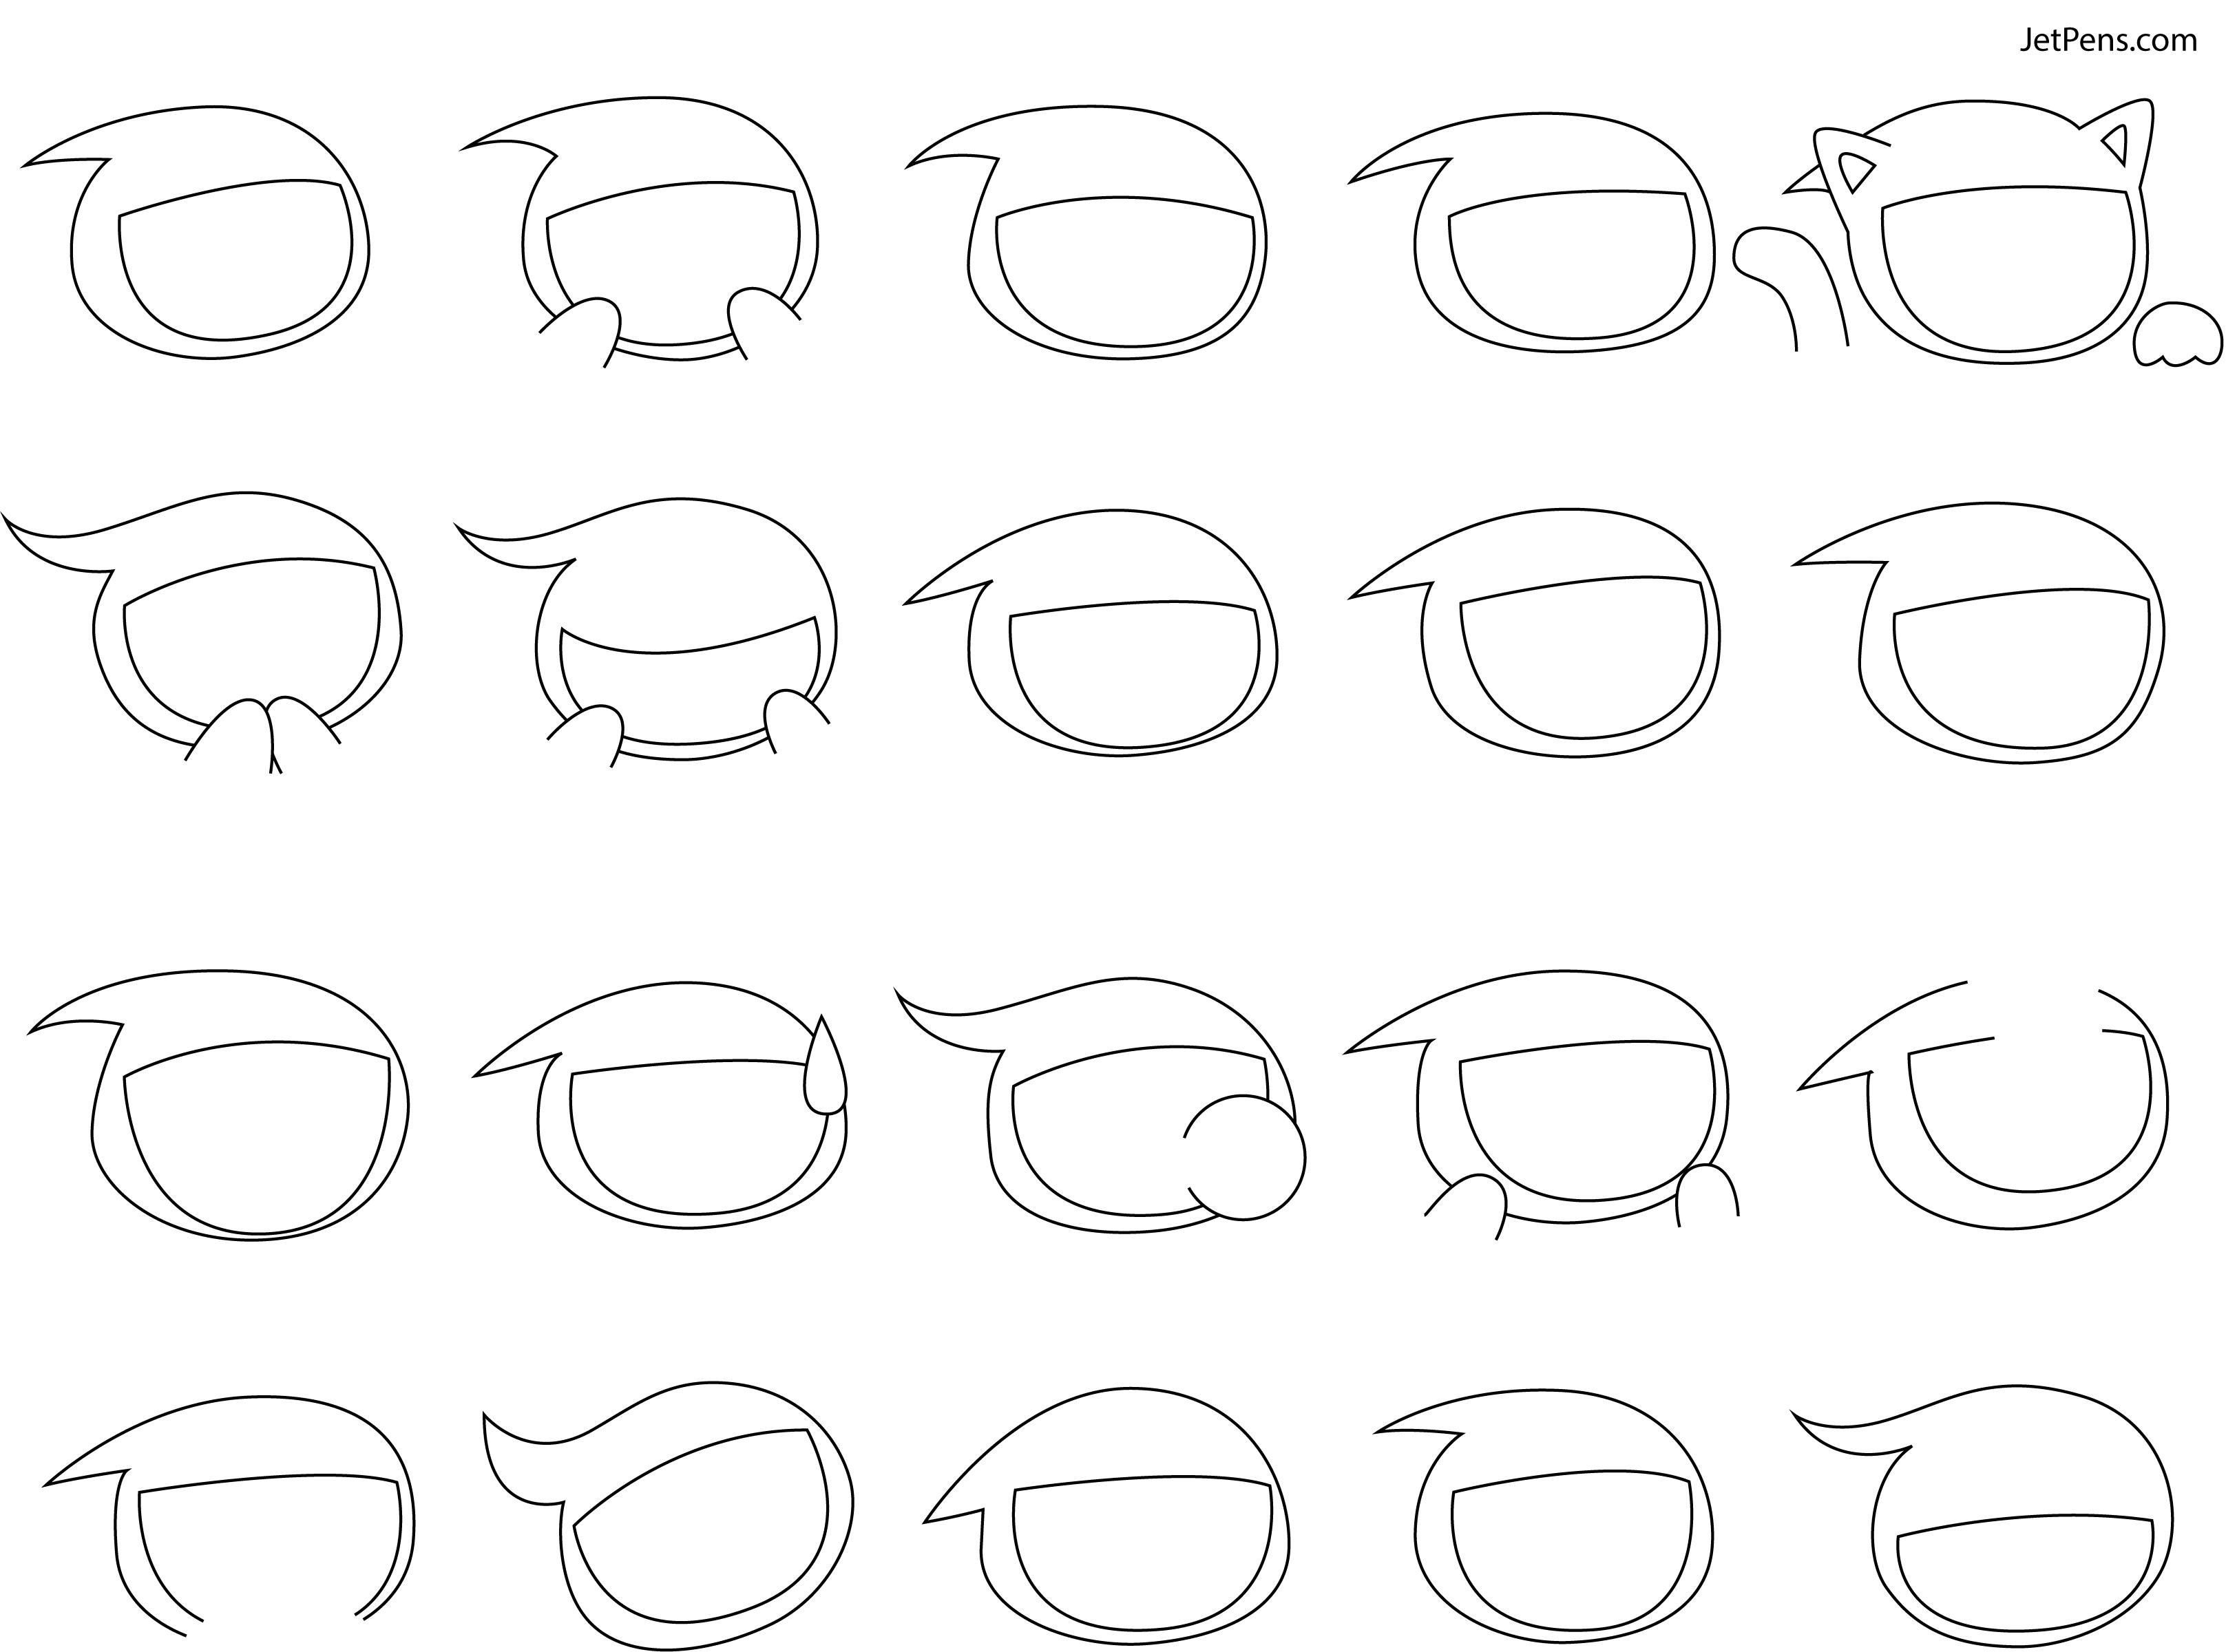 how we love to boldly doodle jetpens com